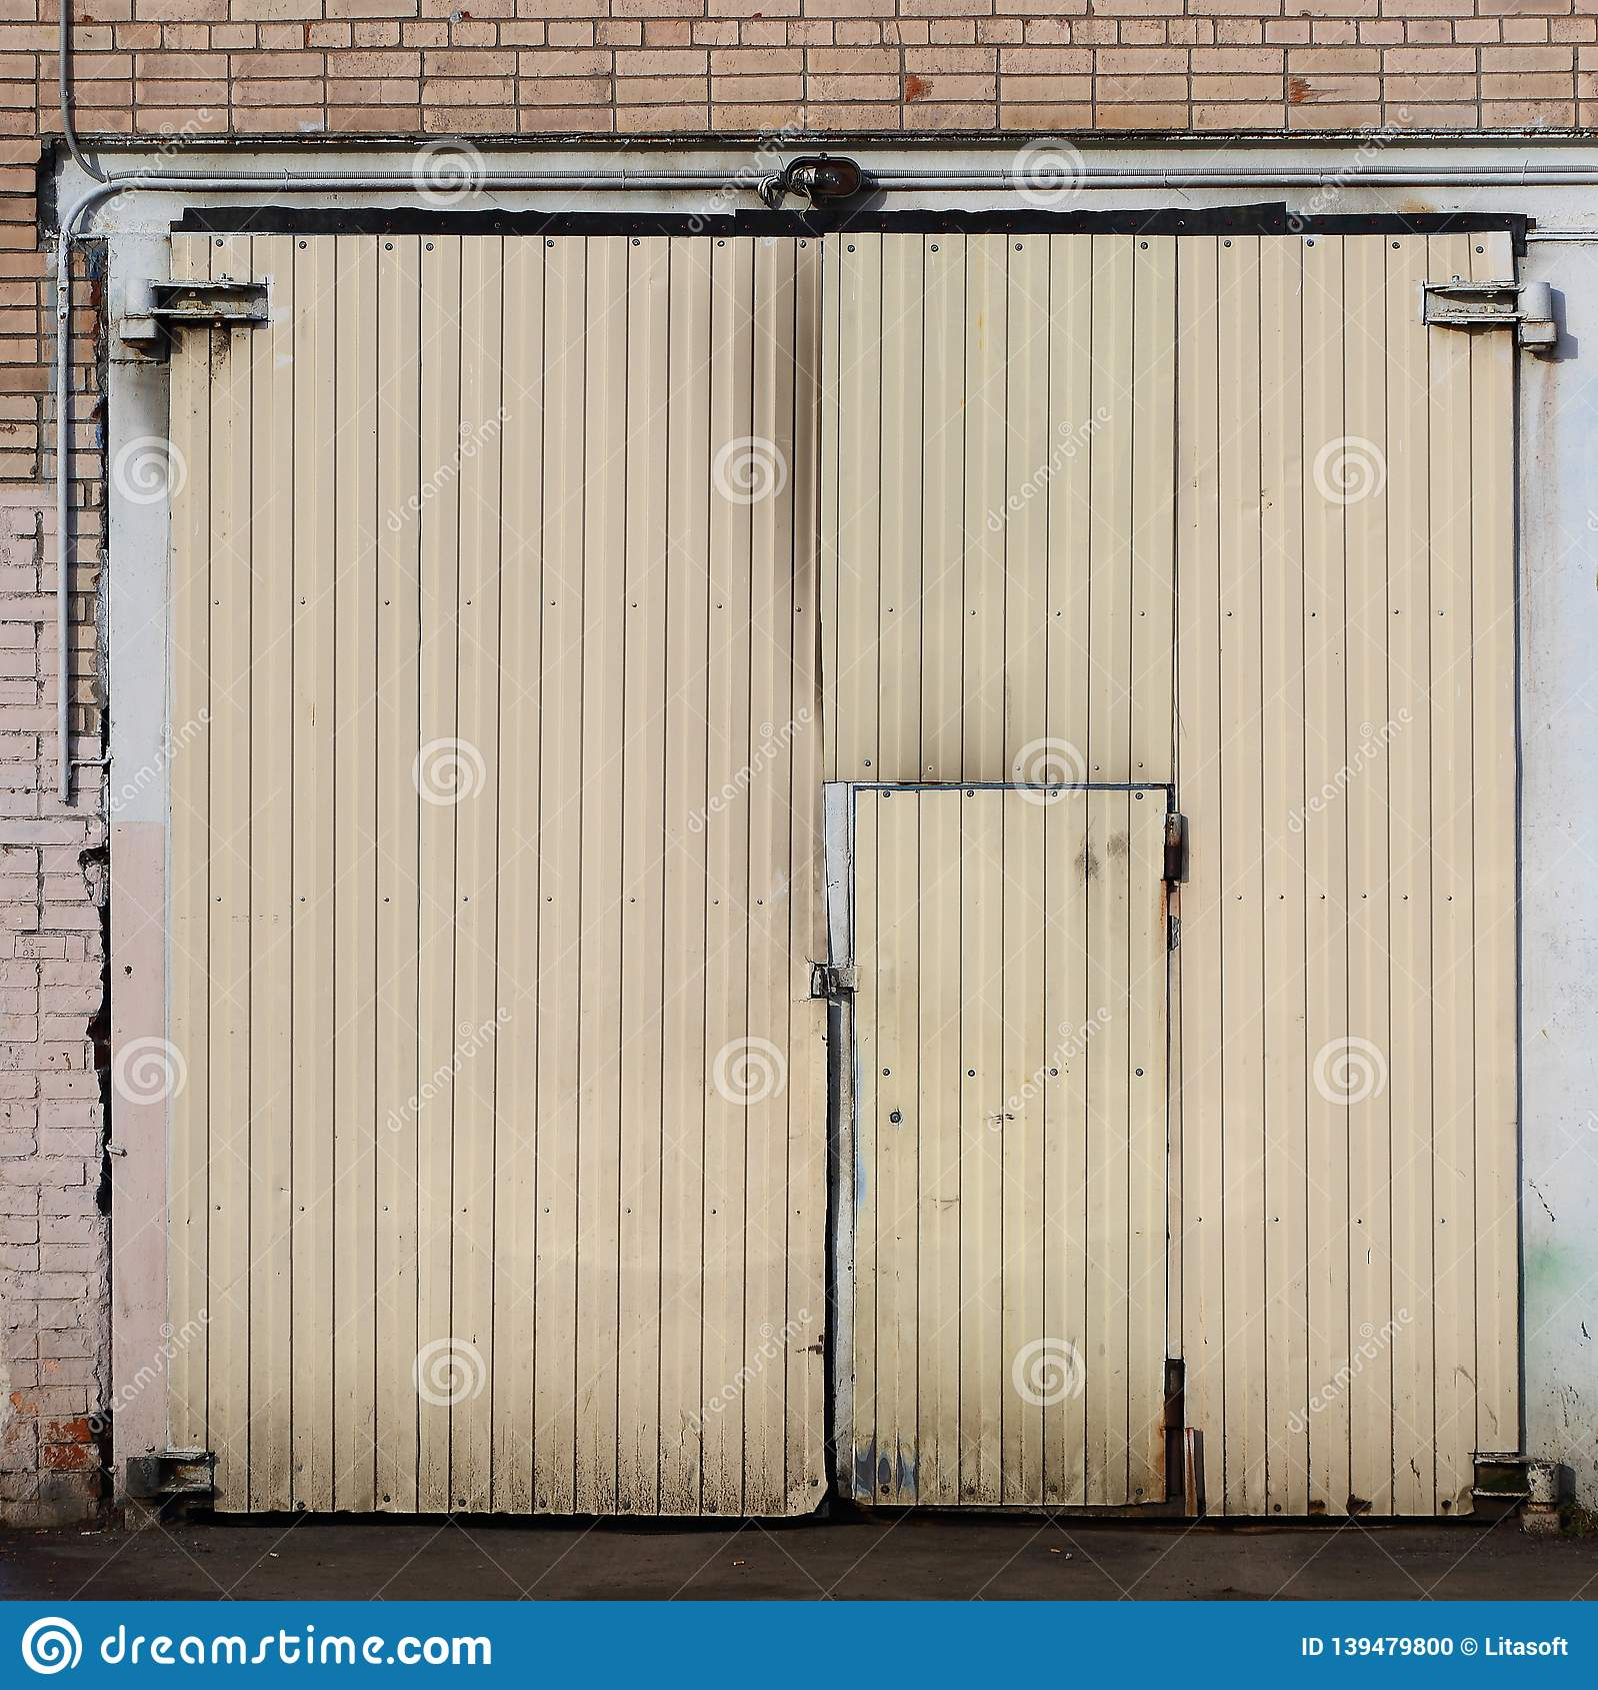 A Garage Door Made Of Light Corrugated Sheet Metal